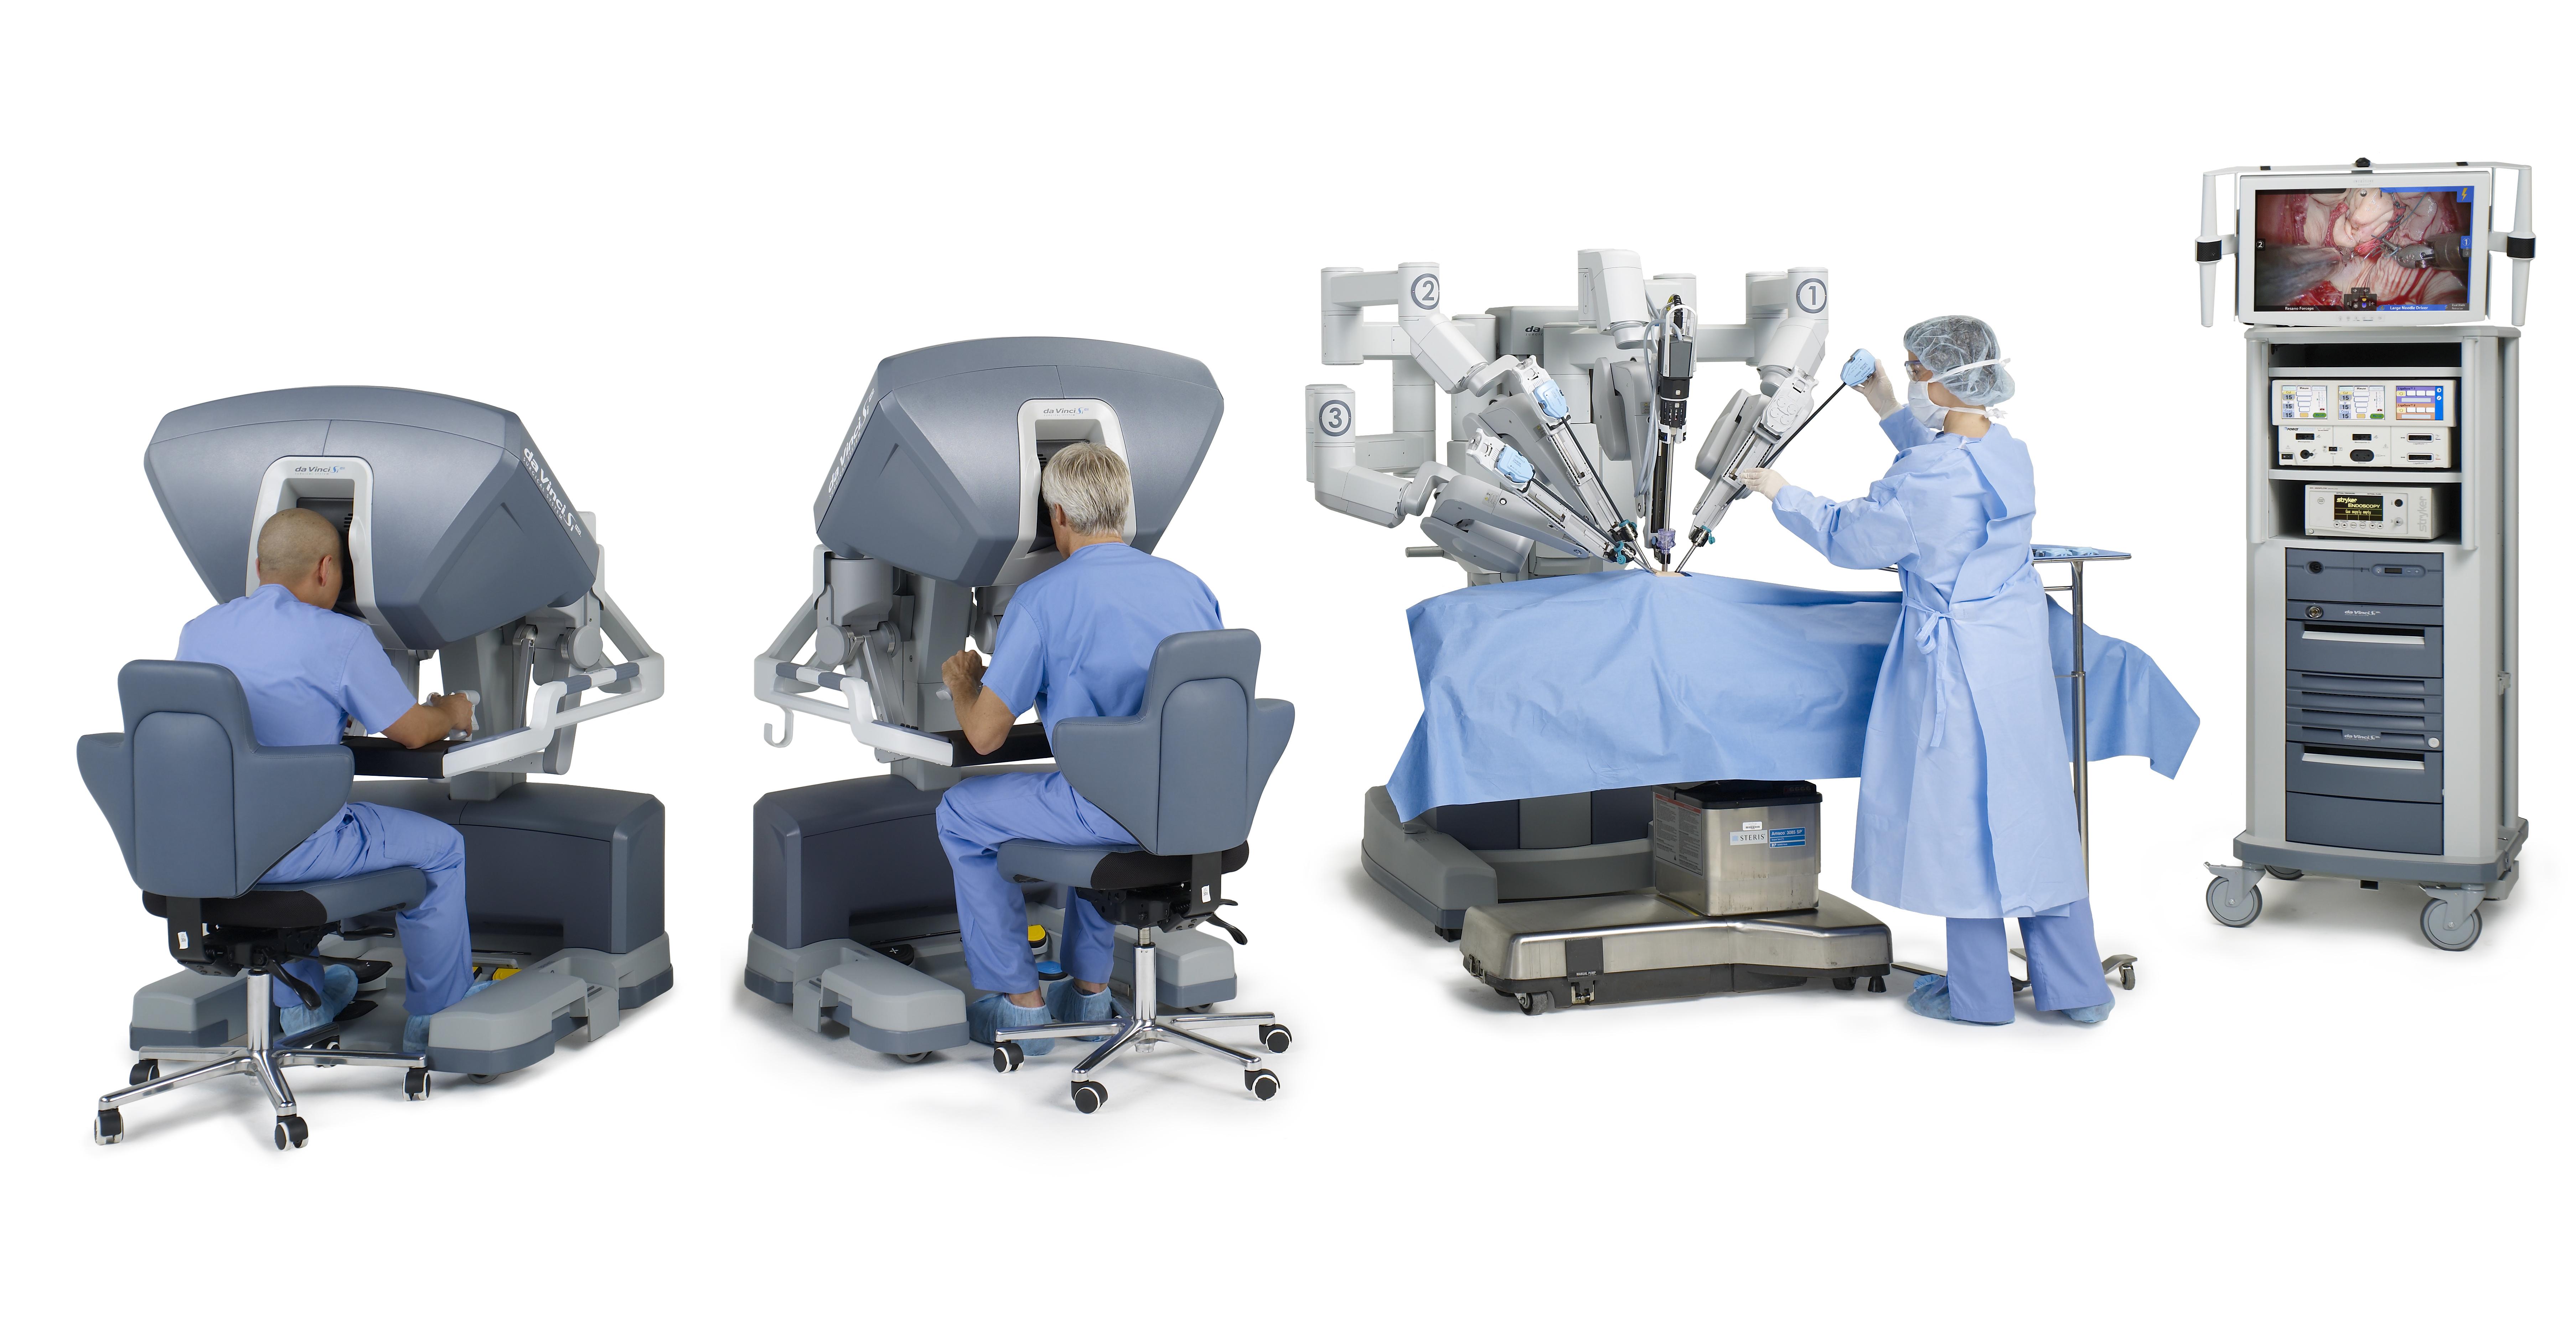 Si_0185_ two_male_surgeons_lookin_in.jpg